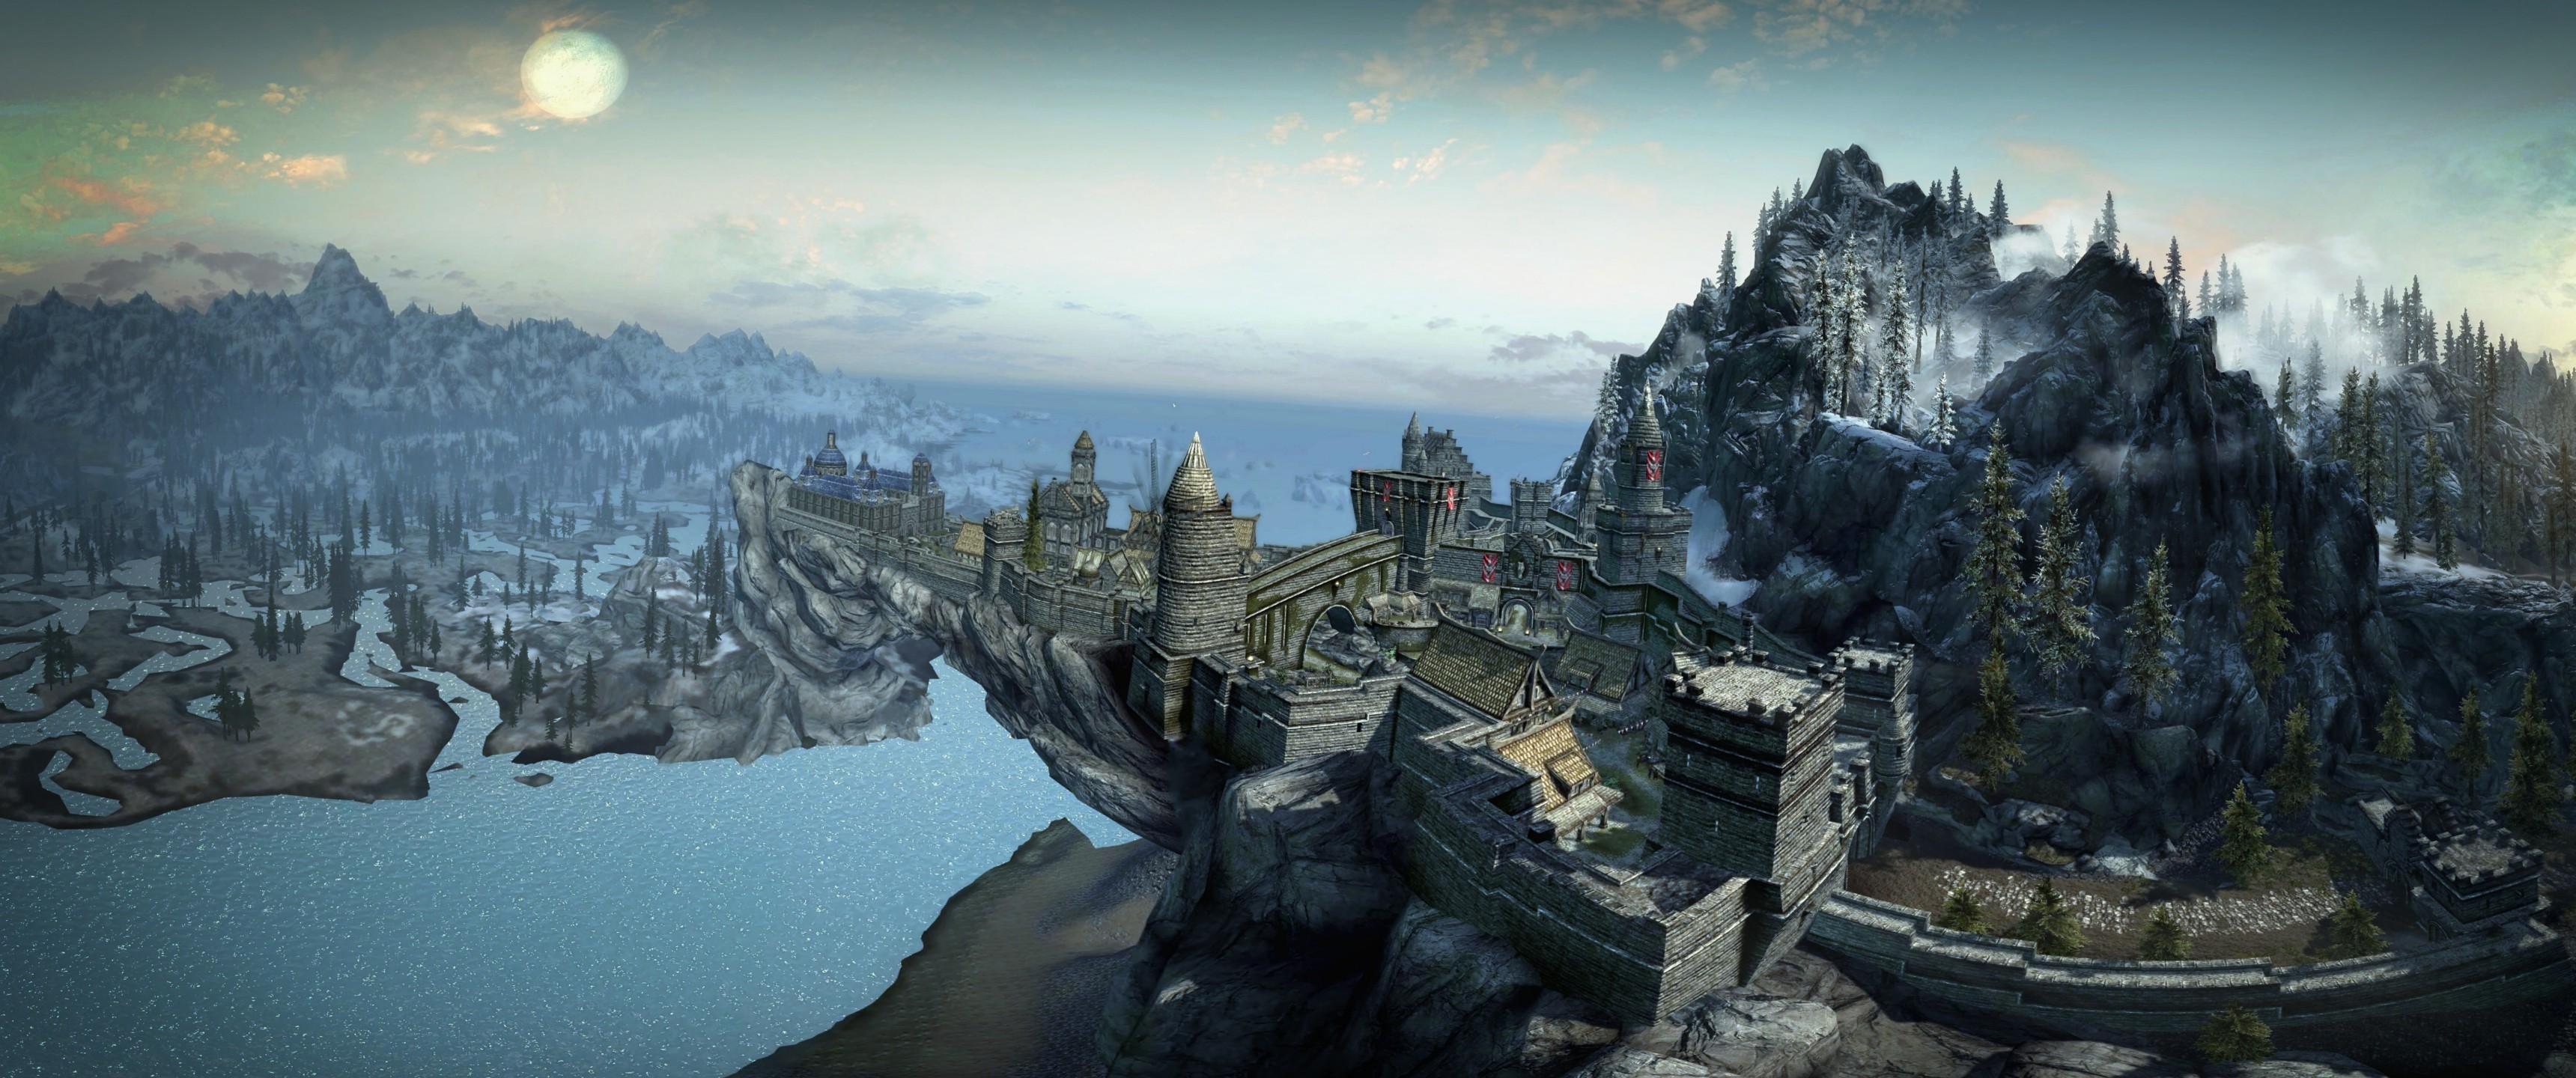 Wallpaper : 3440x1440 px, The Elder Scrolls V Skyrim ...